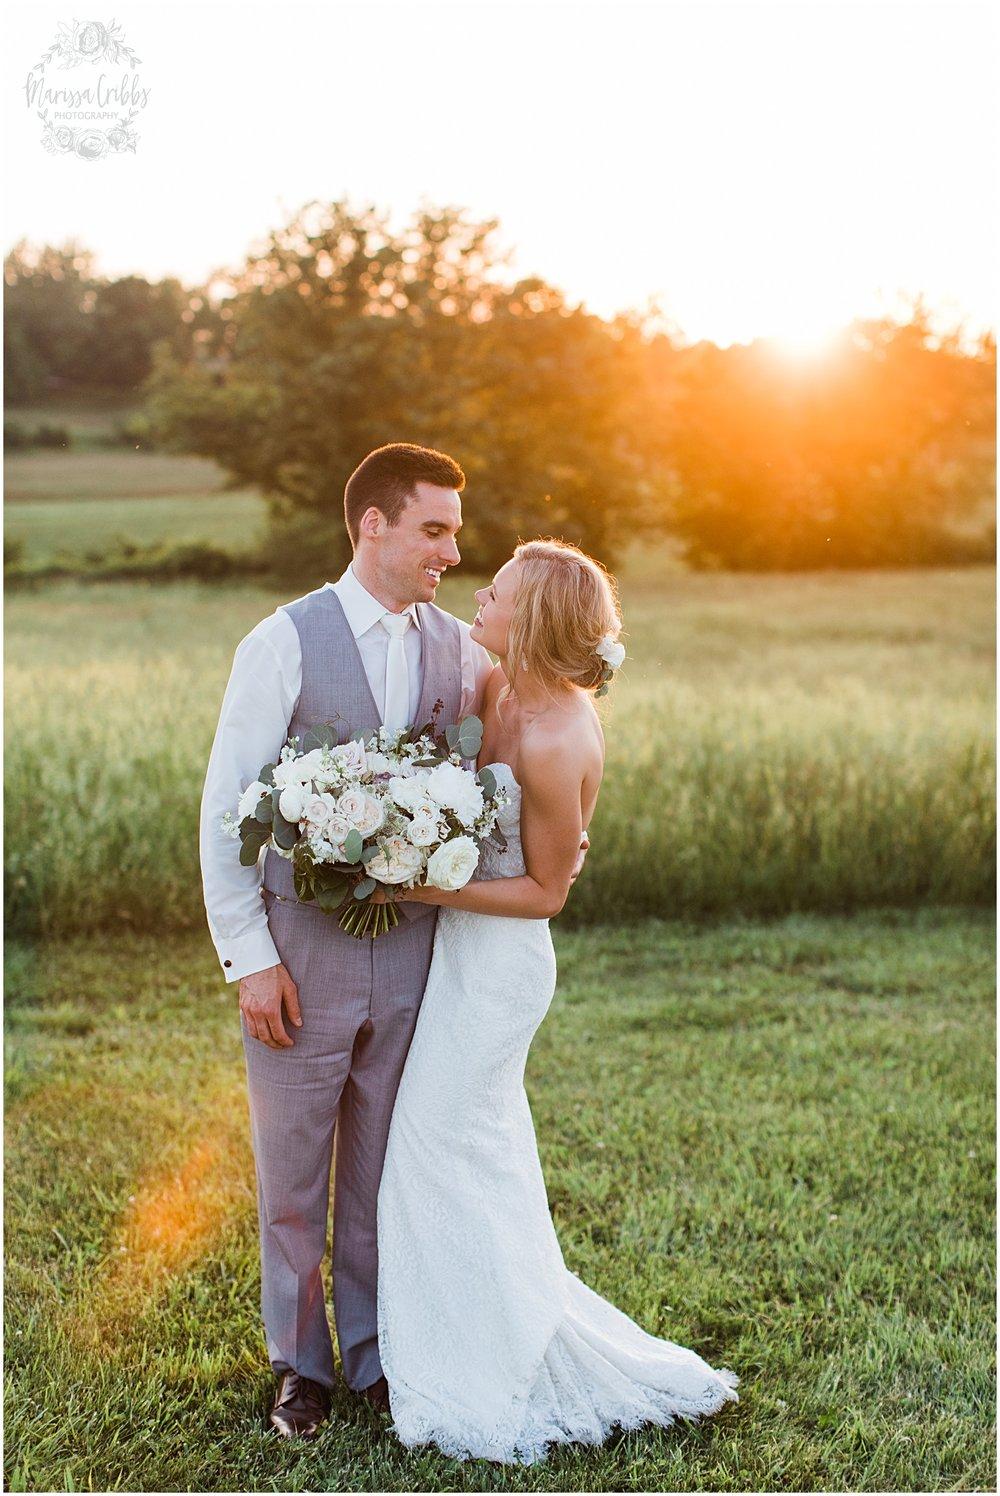 RHODES WEDDING | WESTON RED BARN FARM | MARISSA CRIBBS PHOTOGRAPHY_5324.jpg